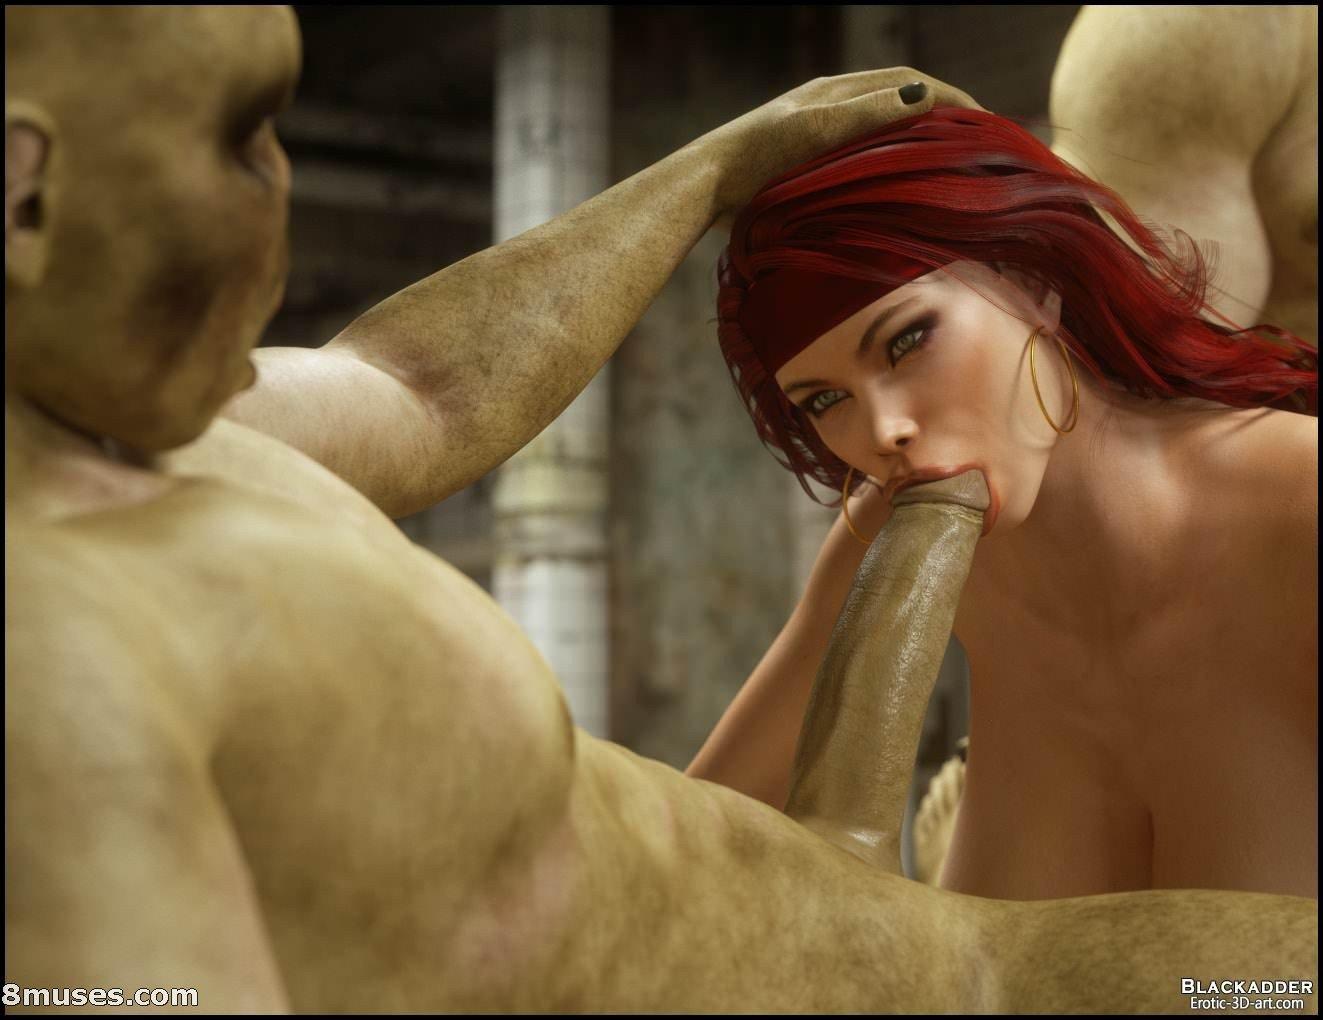 3d 8muses ass big_breasts blackadder breasts fellatio miriam oral orc orcs red_head redhead slut watermark web_address